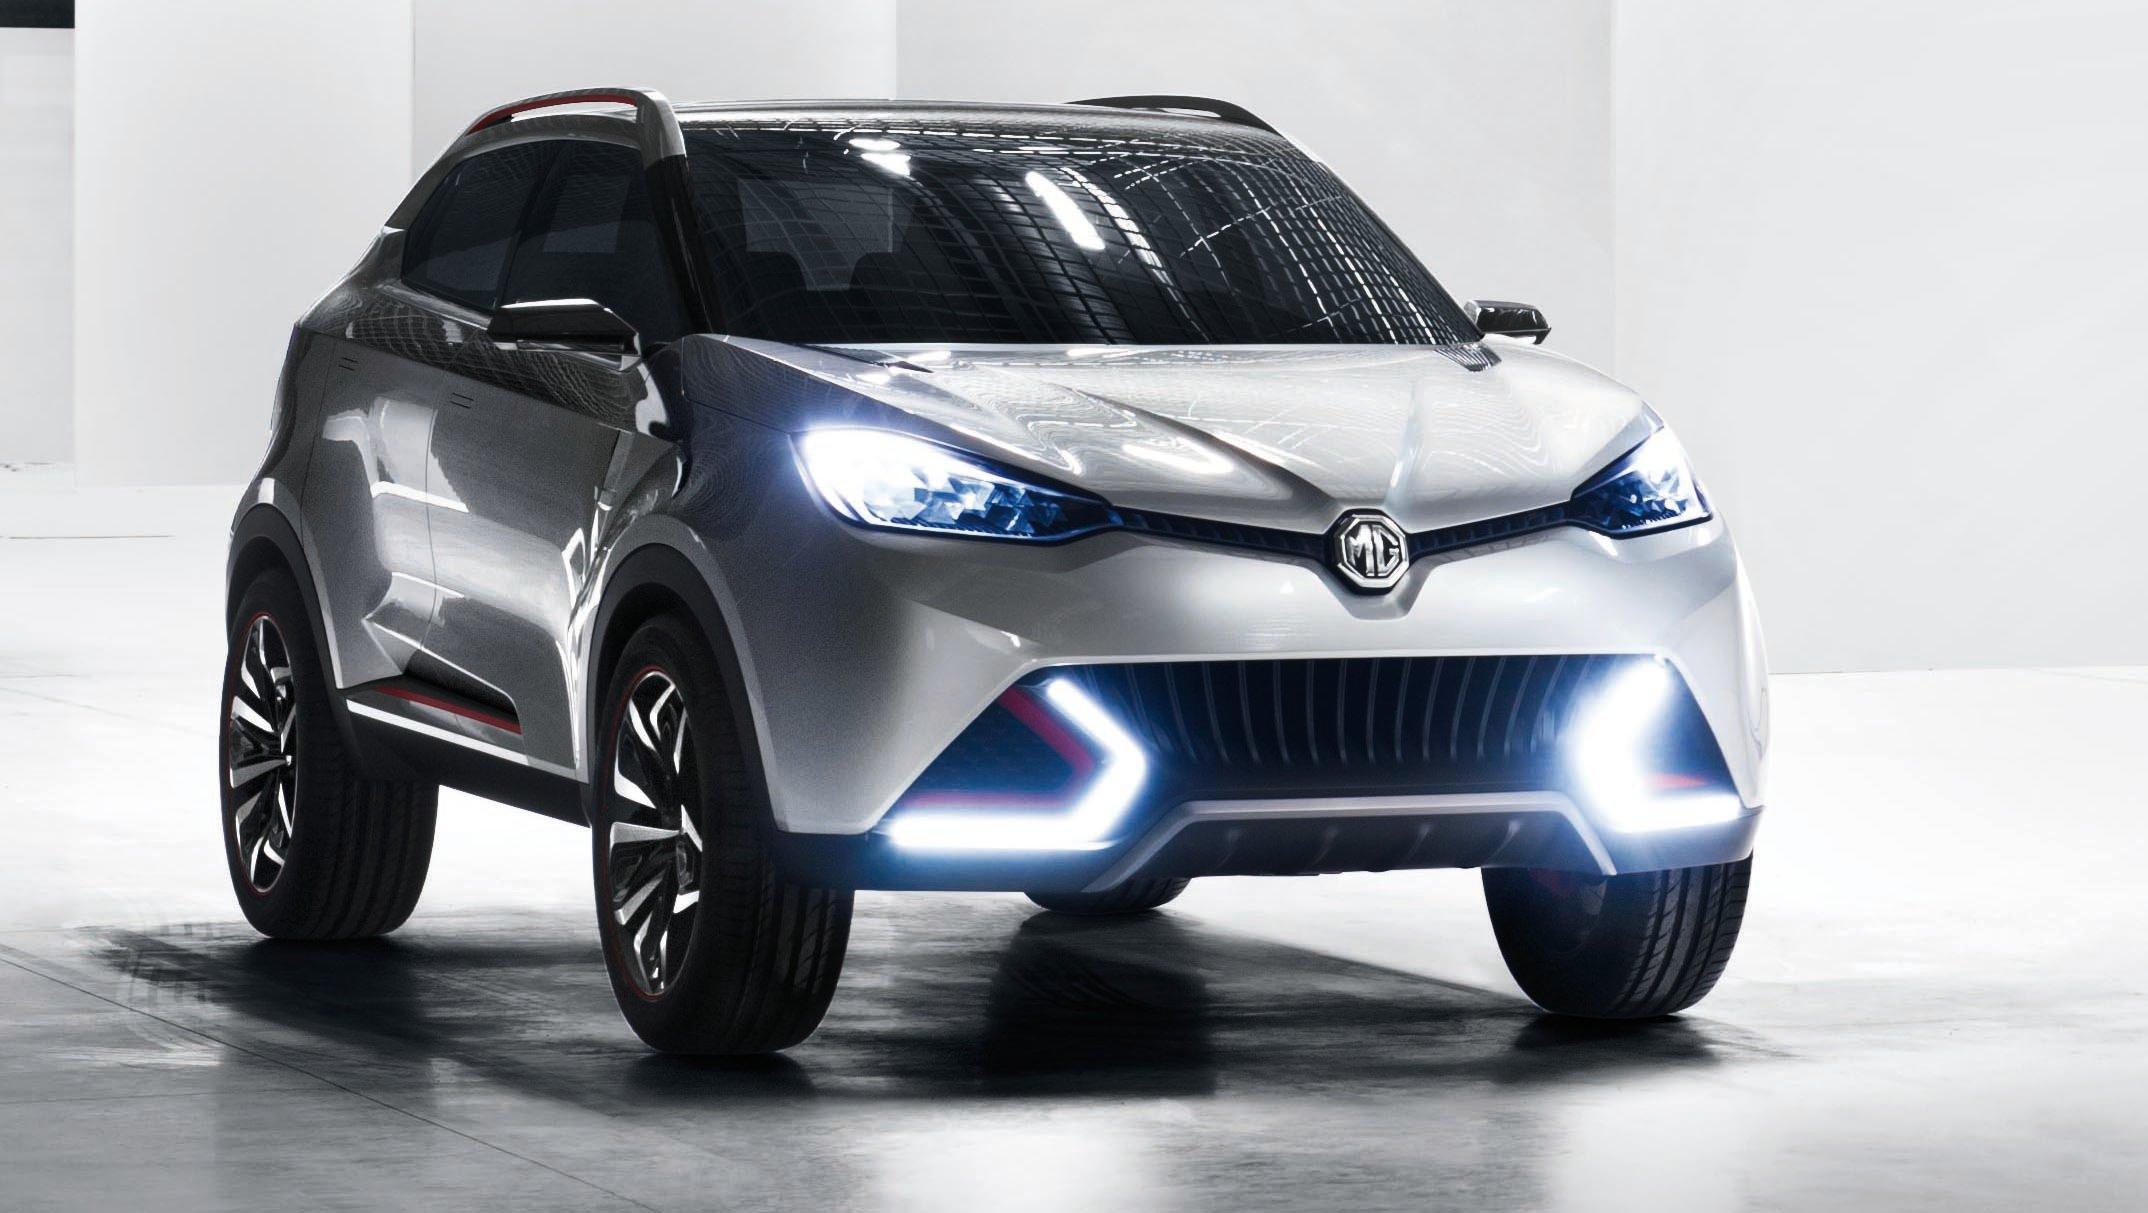 MG CS Concept SUV unveiled at Auto Shanghai 2013